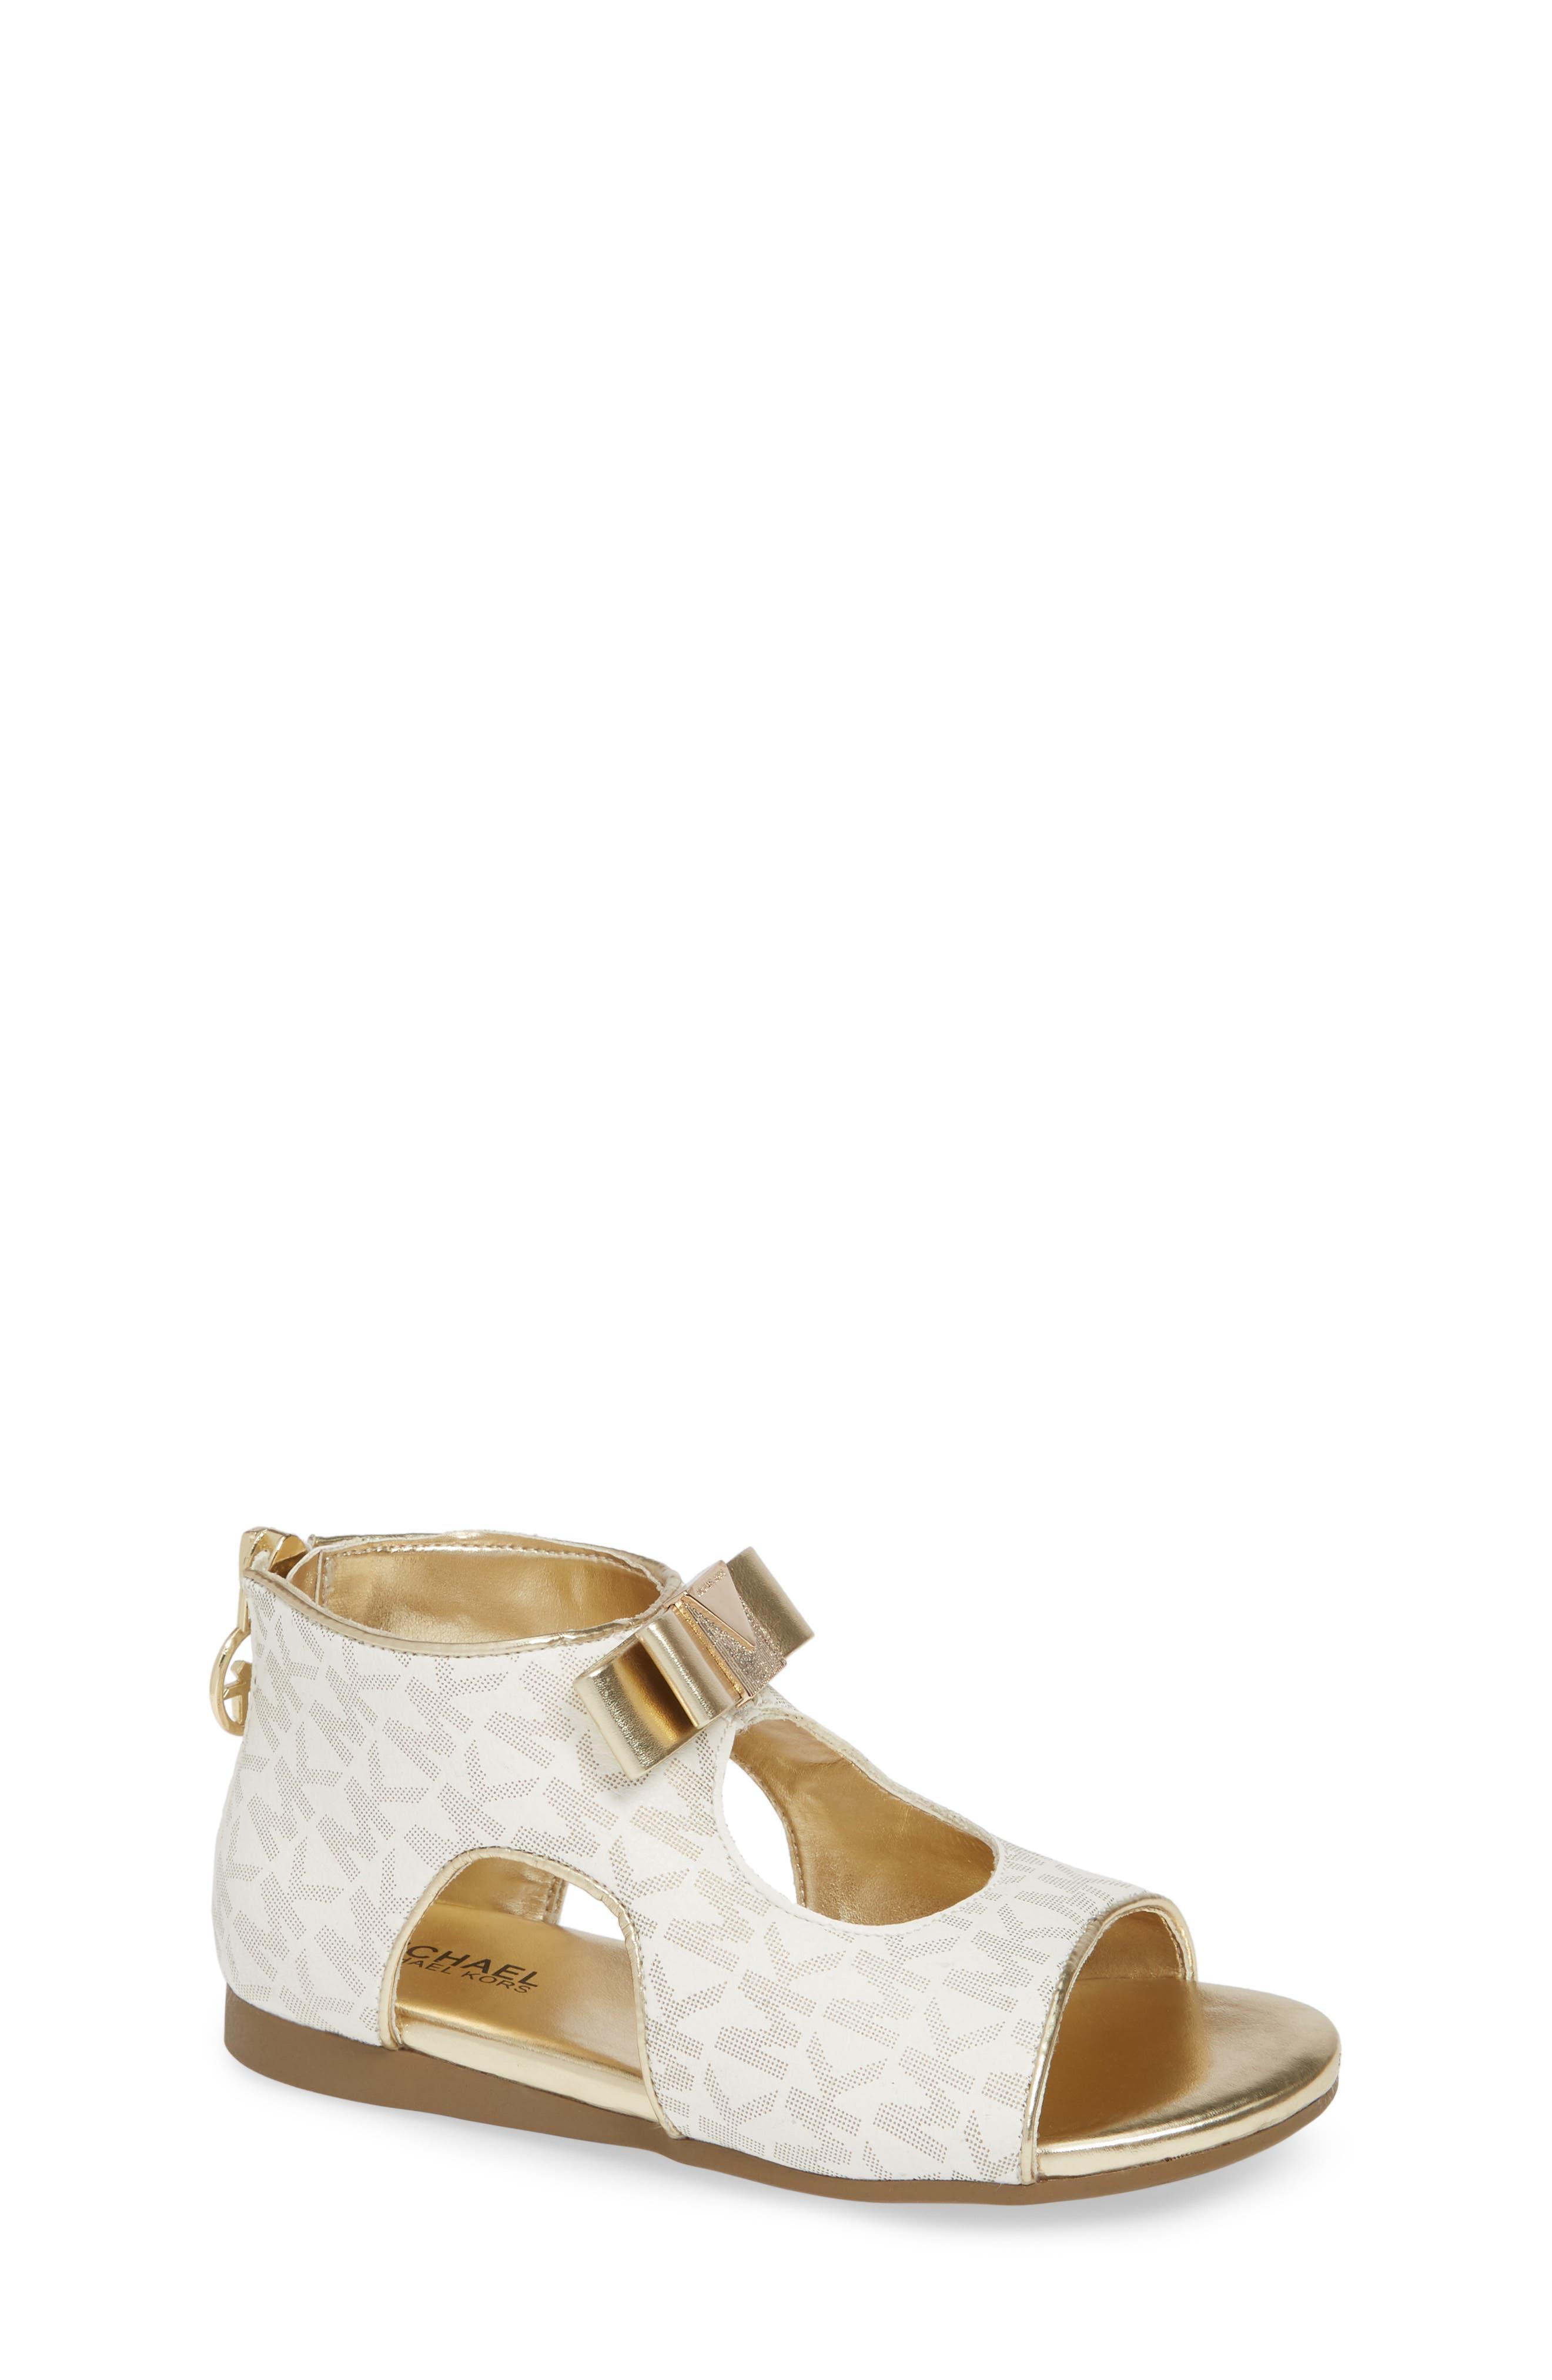 MICHAEL MICHAEL KORS Tilly Dahna Logo Sandal, Main, color, GOLD/ WHITE